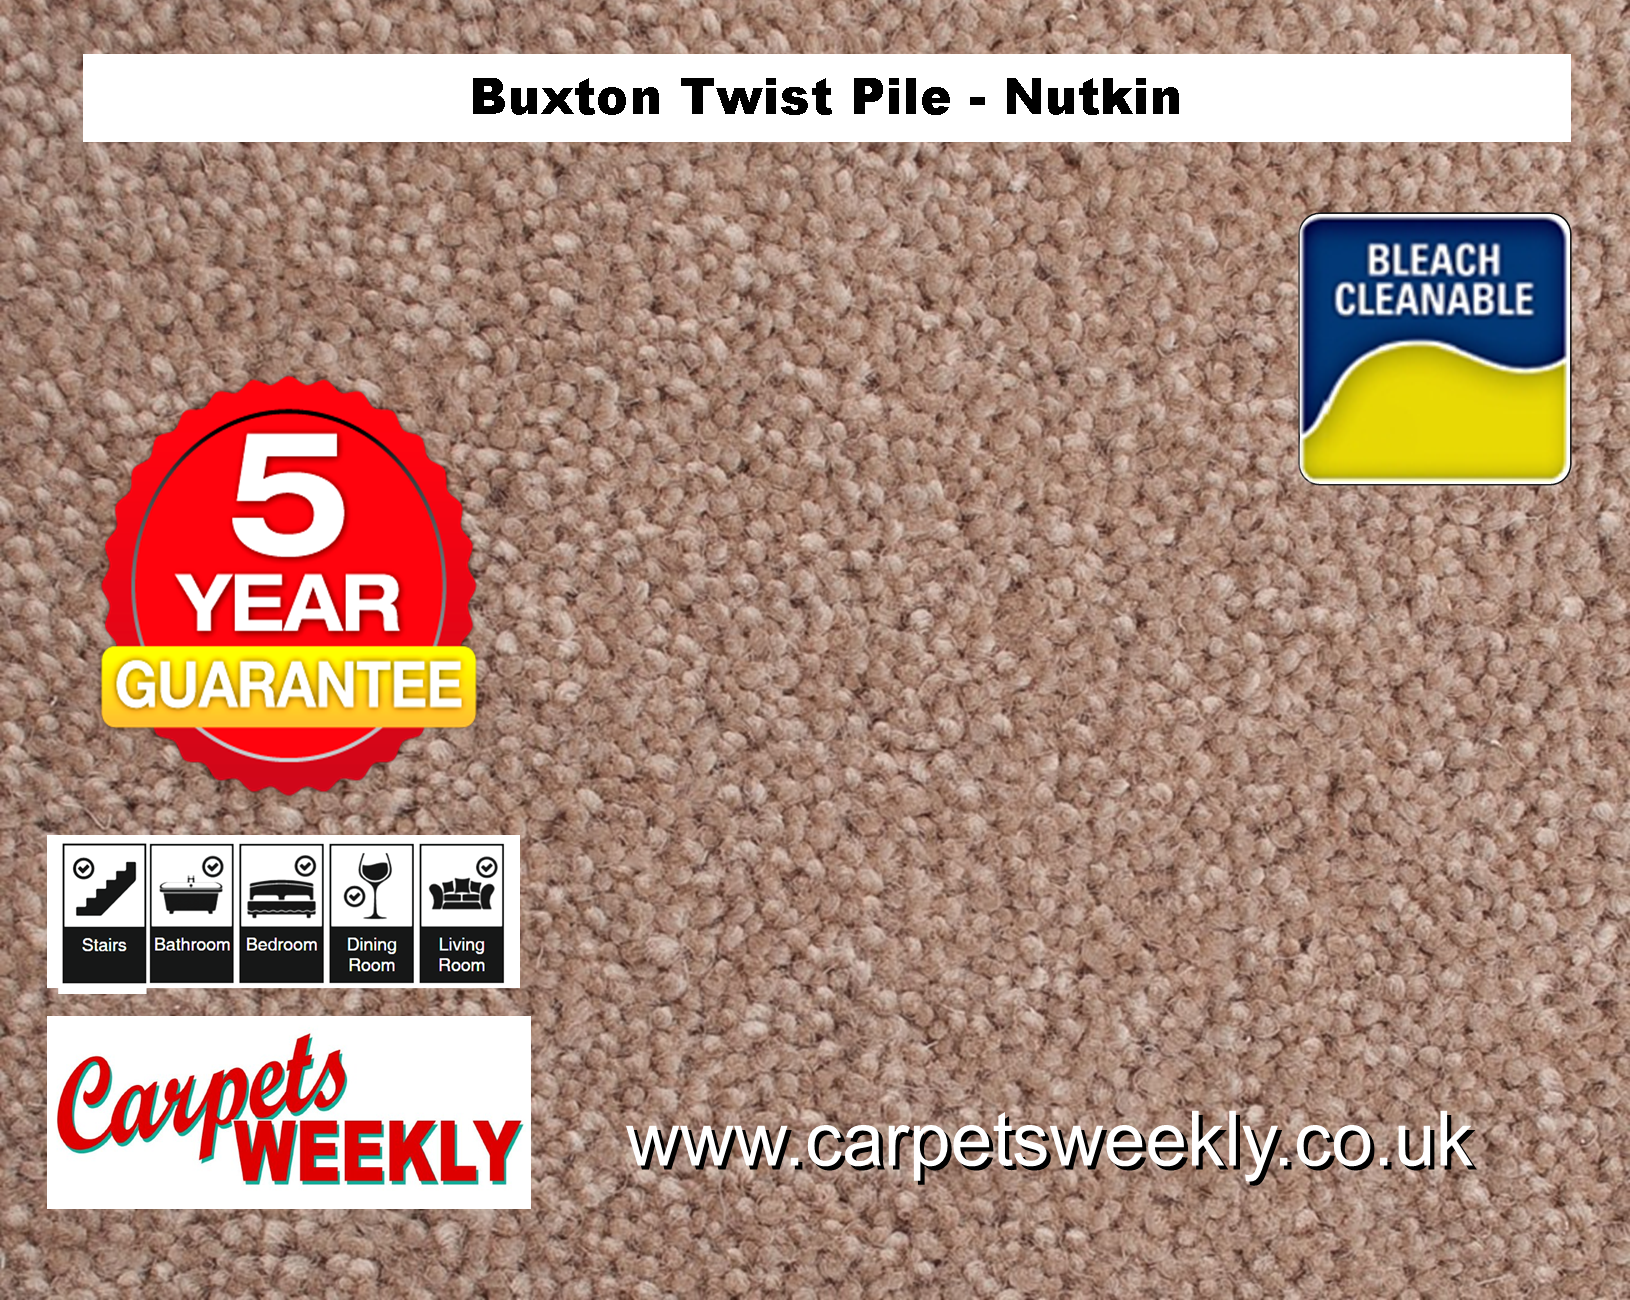 Carpets Weekly Buxton Nutkin Carpets